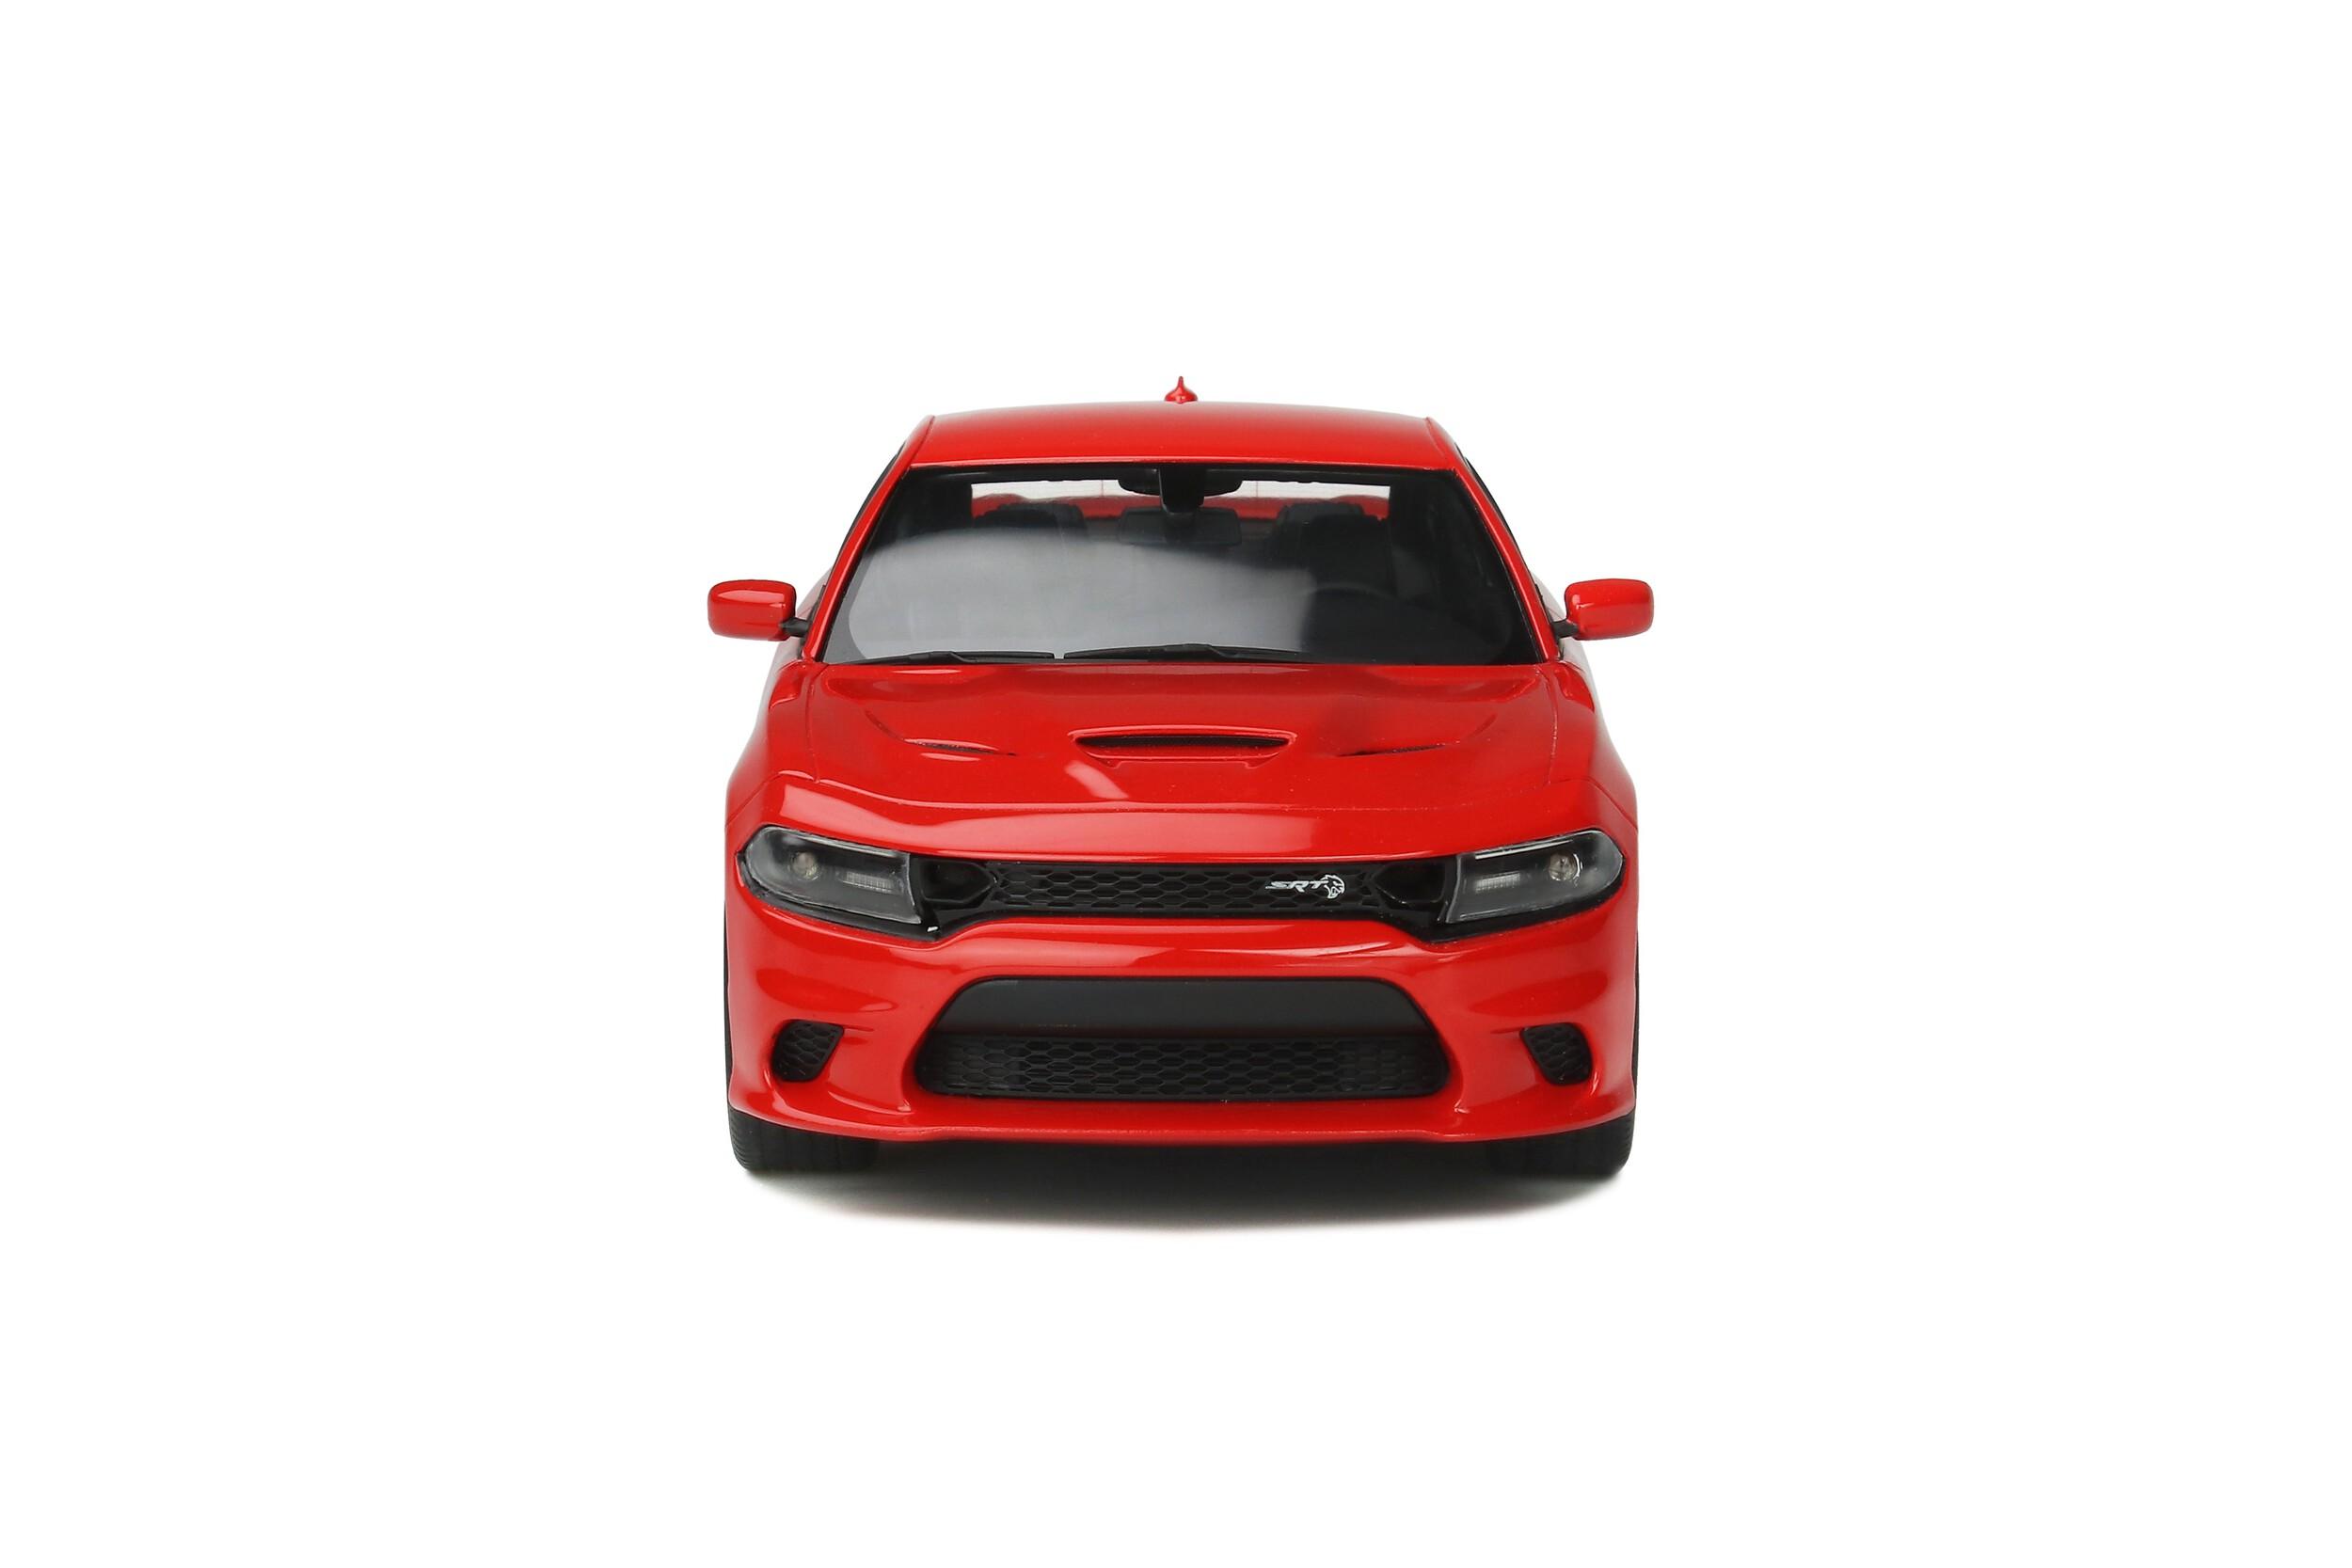 GT280 GT SPIRIT Dodge Charger SRT Hellcat 2020 Red 1//18